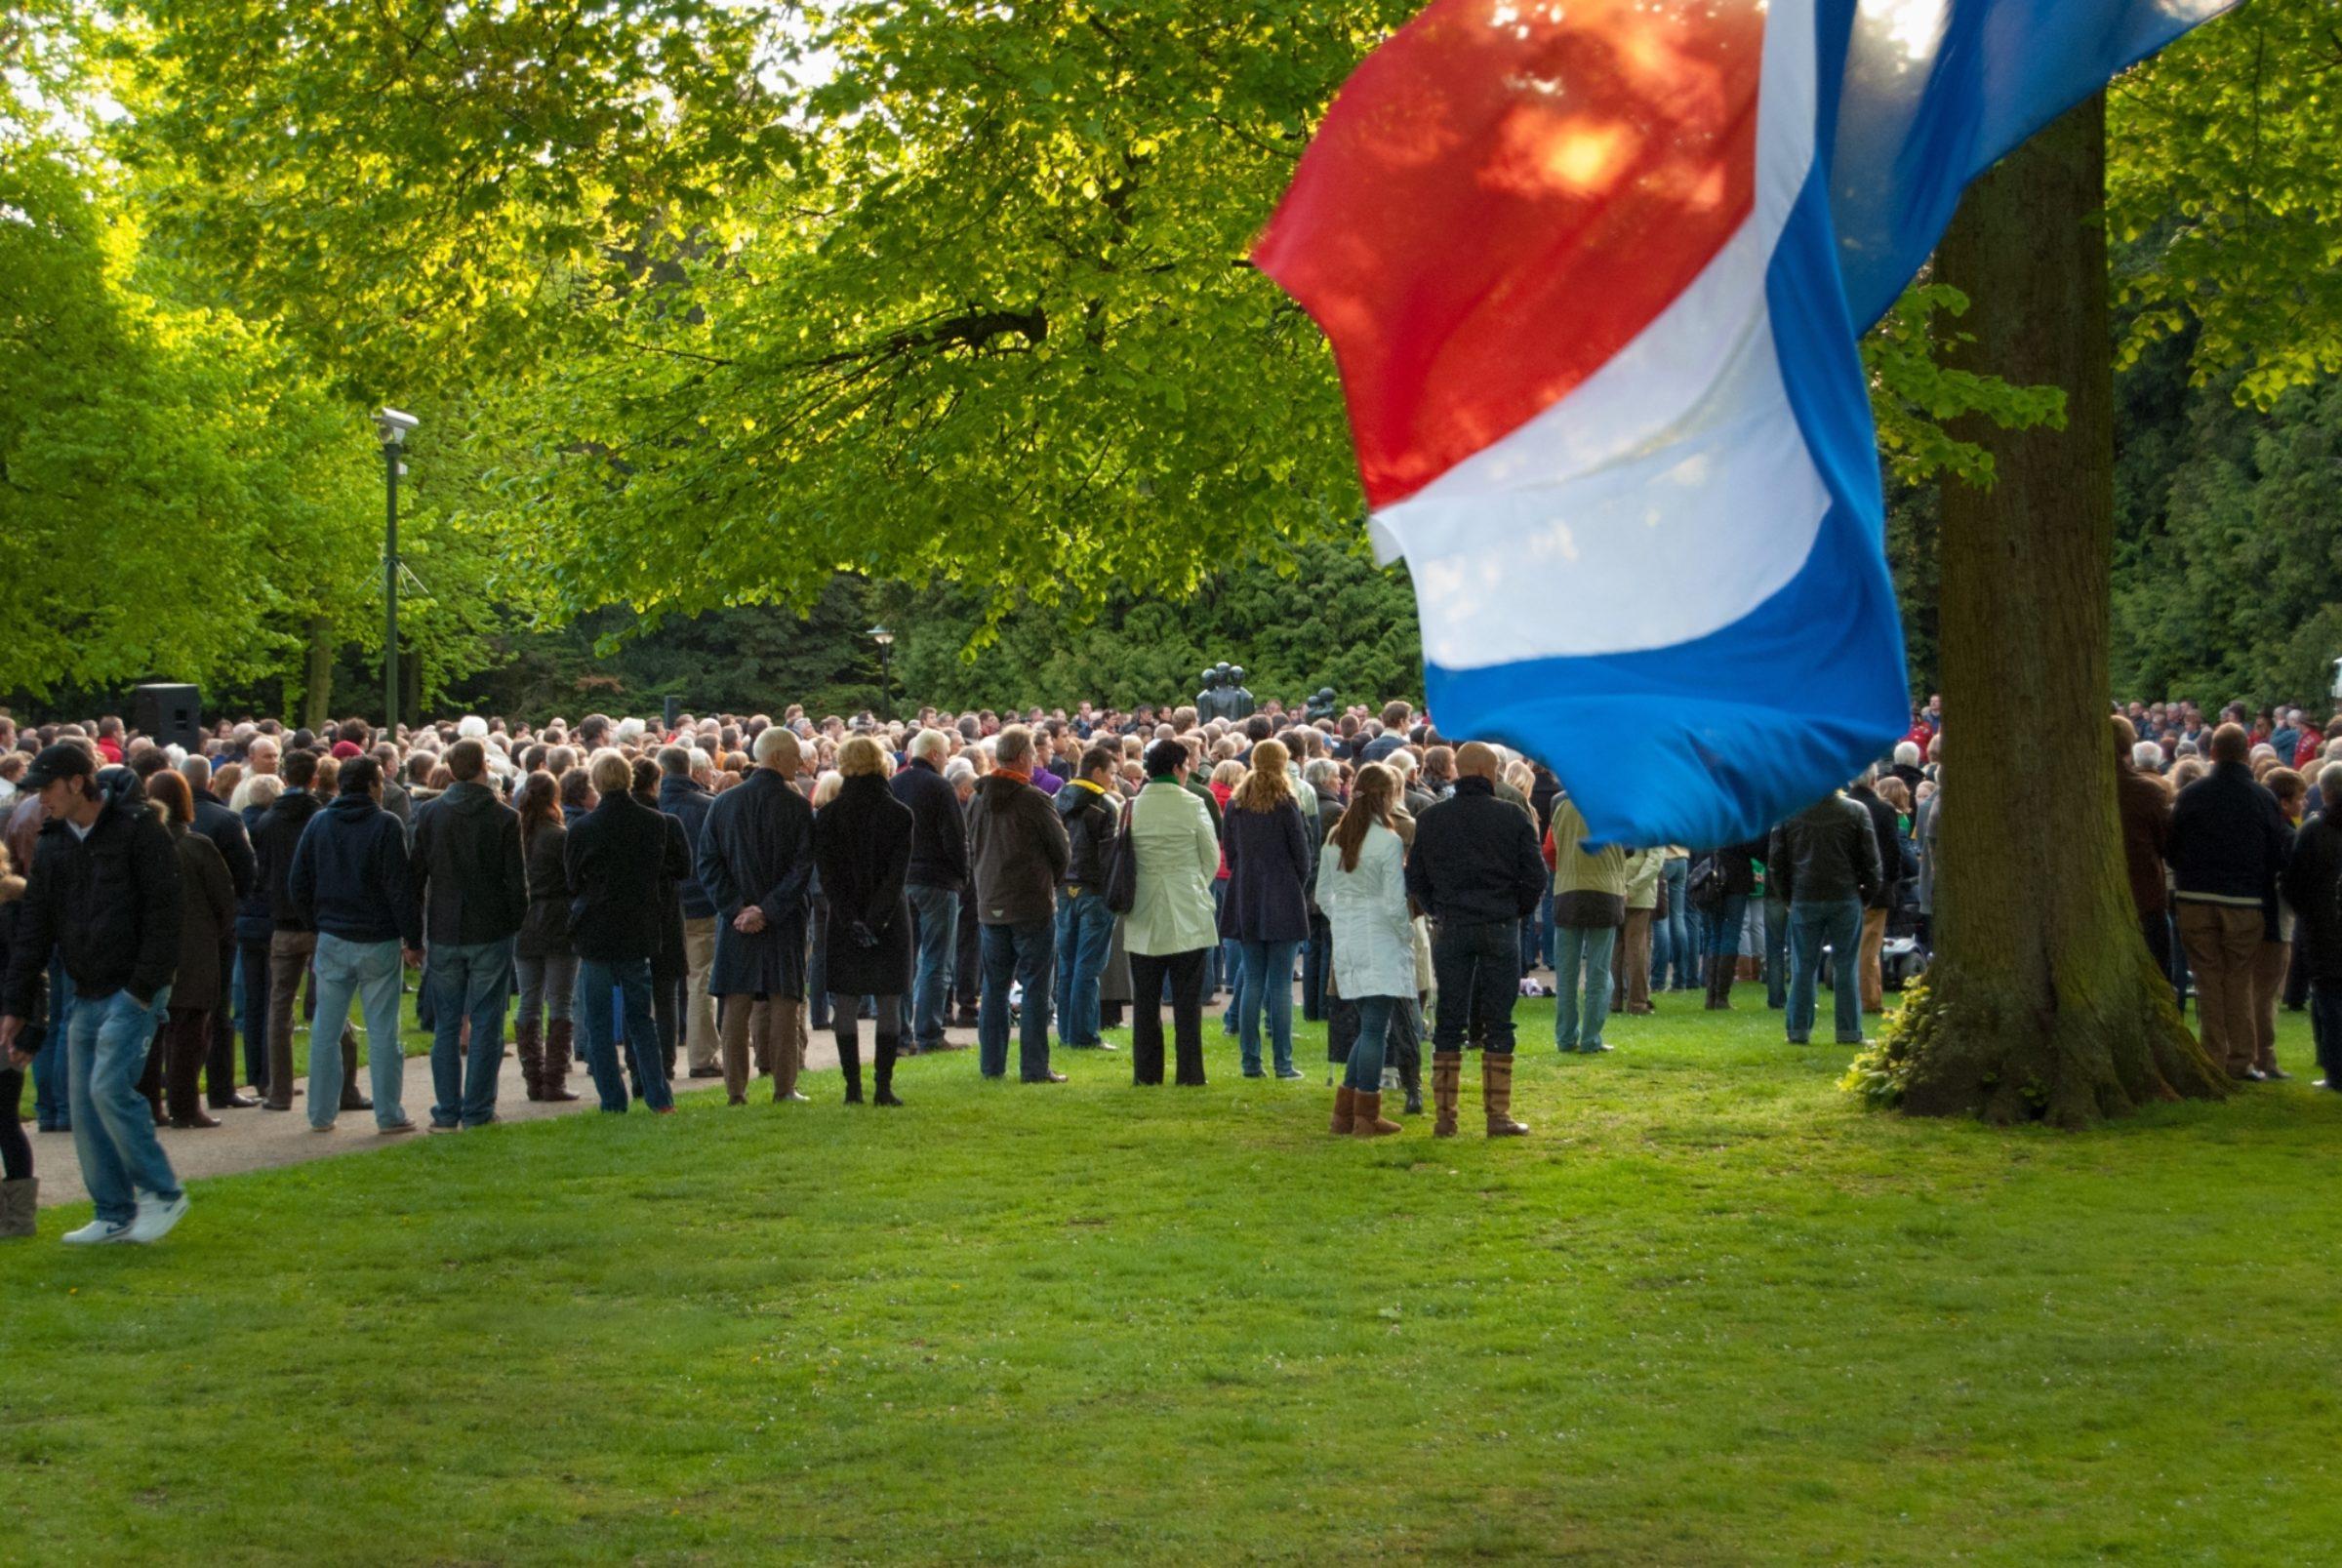 Dodenherdenking 4 mei Enschede 35hsuuarle